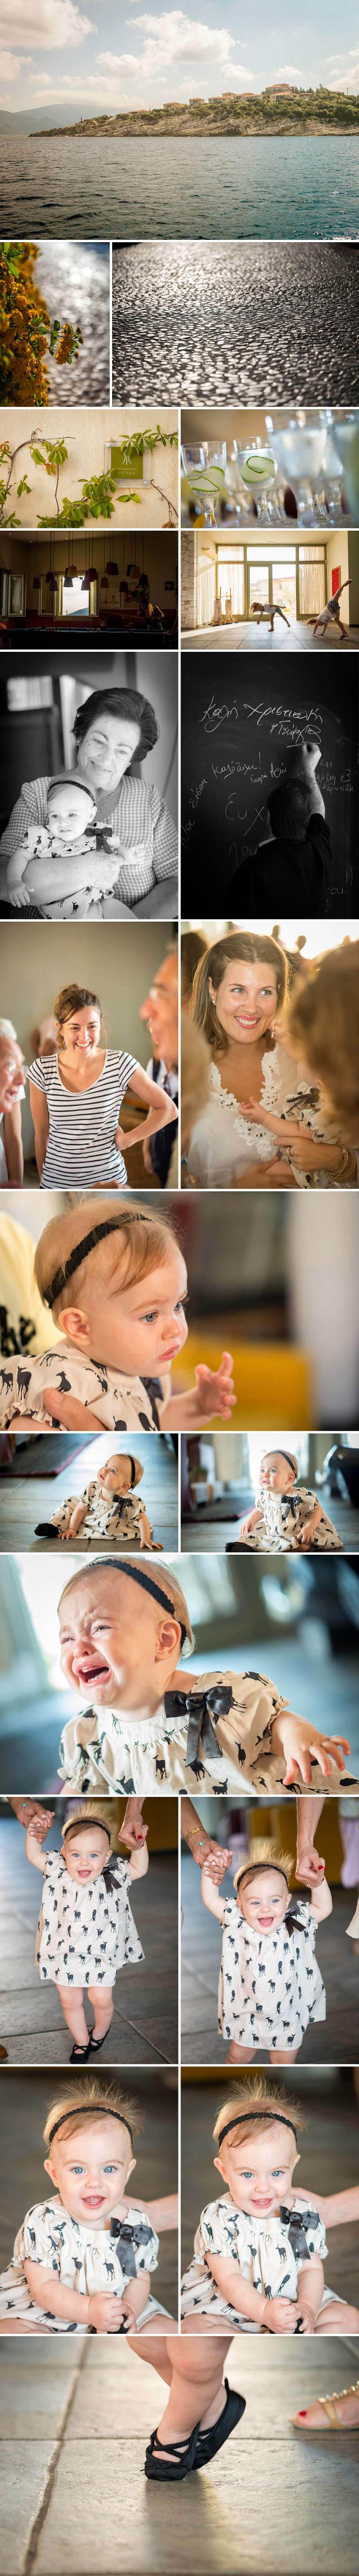 Stefania Christening Stories